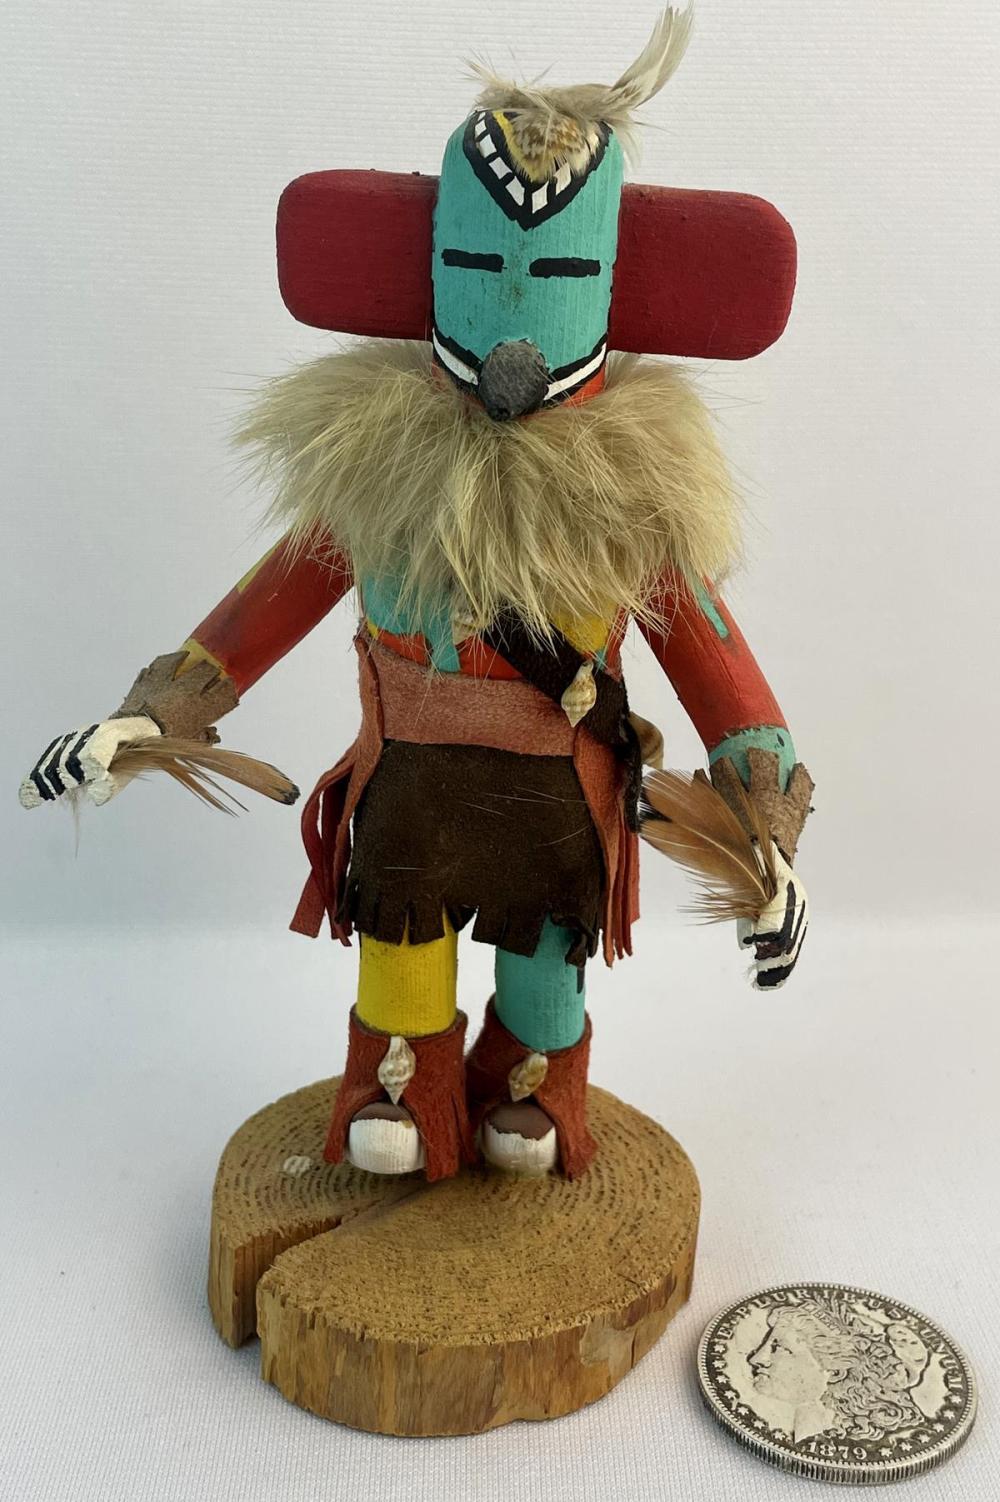 Vintage 1989 Signed G. Yazzie Native American Hopi Kachina Humming Bird Carved Wood Figurine